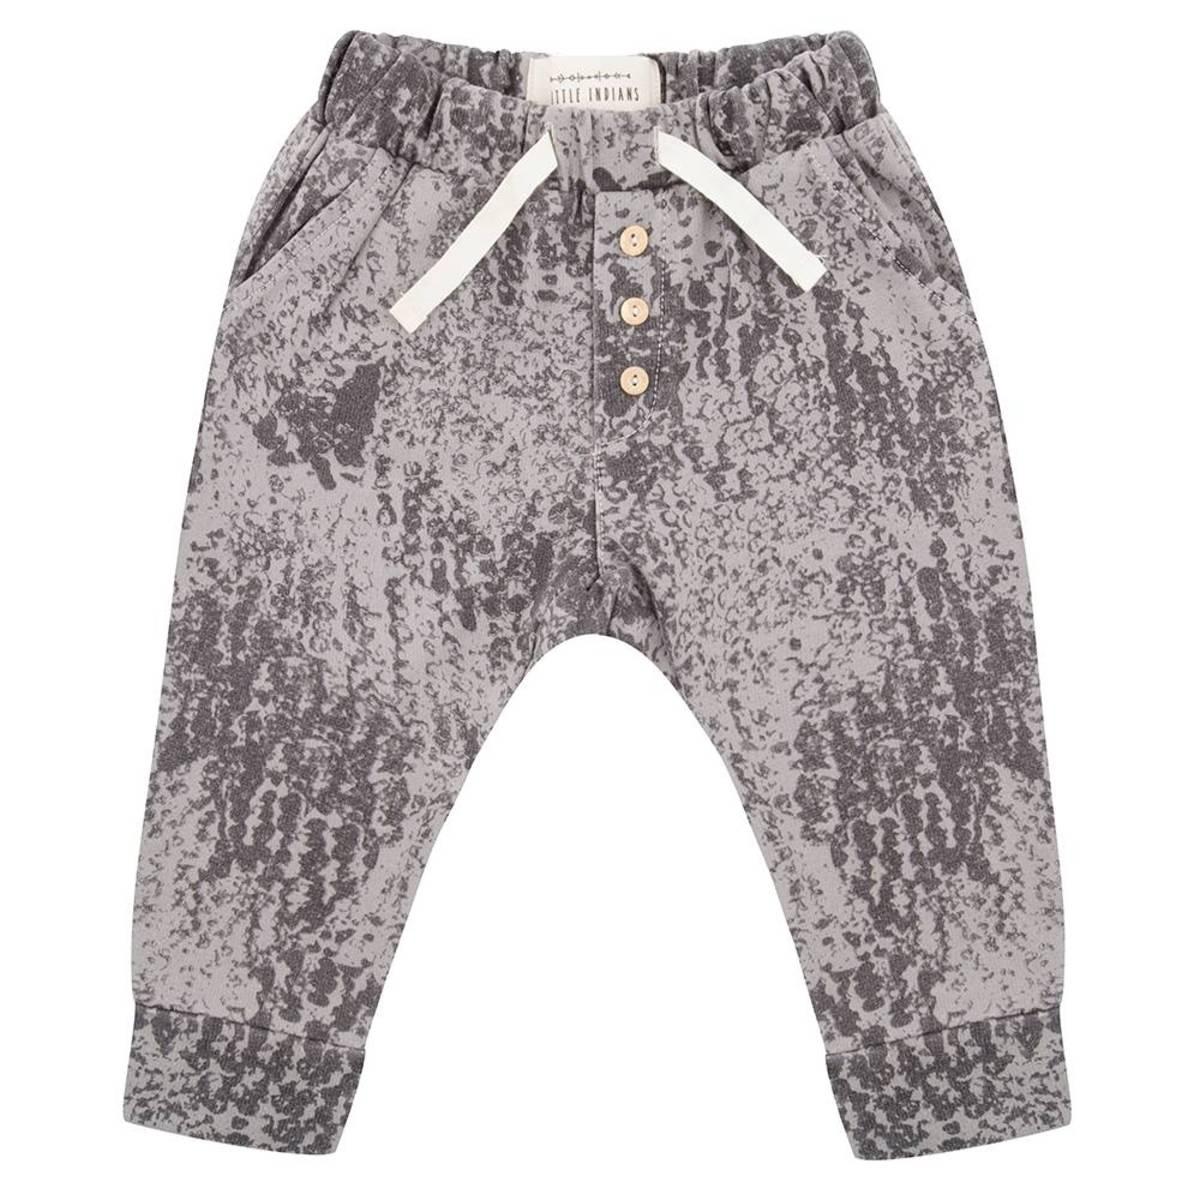 Bas Bébé Pantalon World Broek Gris - 6/9 mois Pantalon World Broek Gris - 6/9 mois